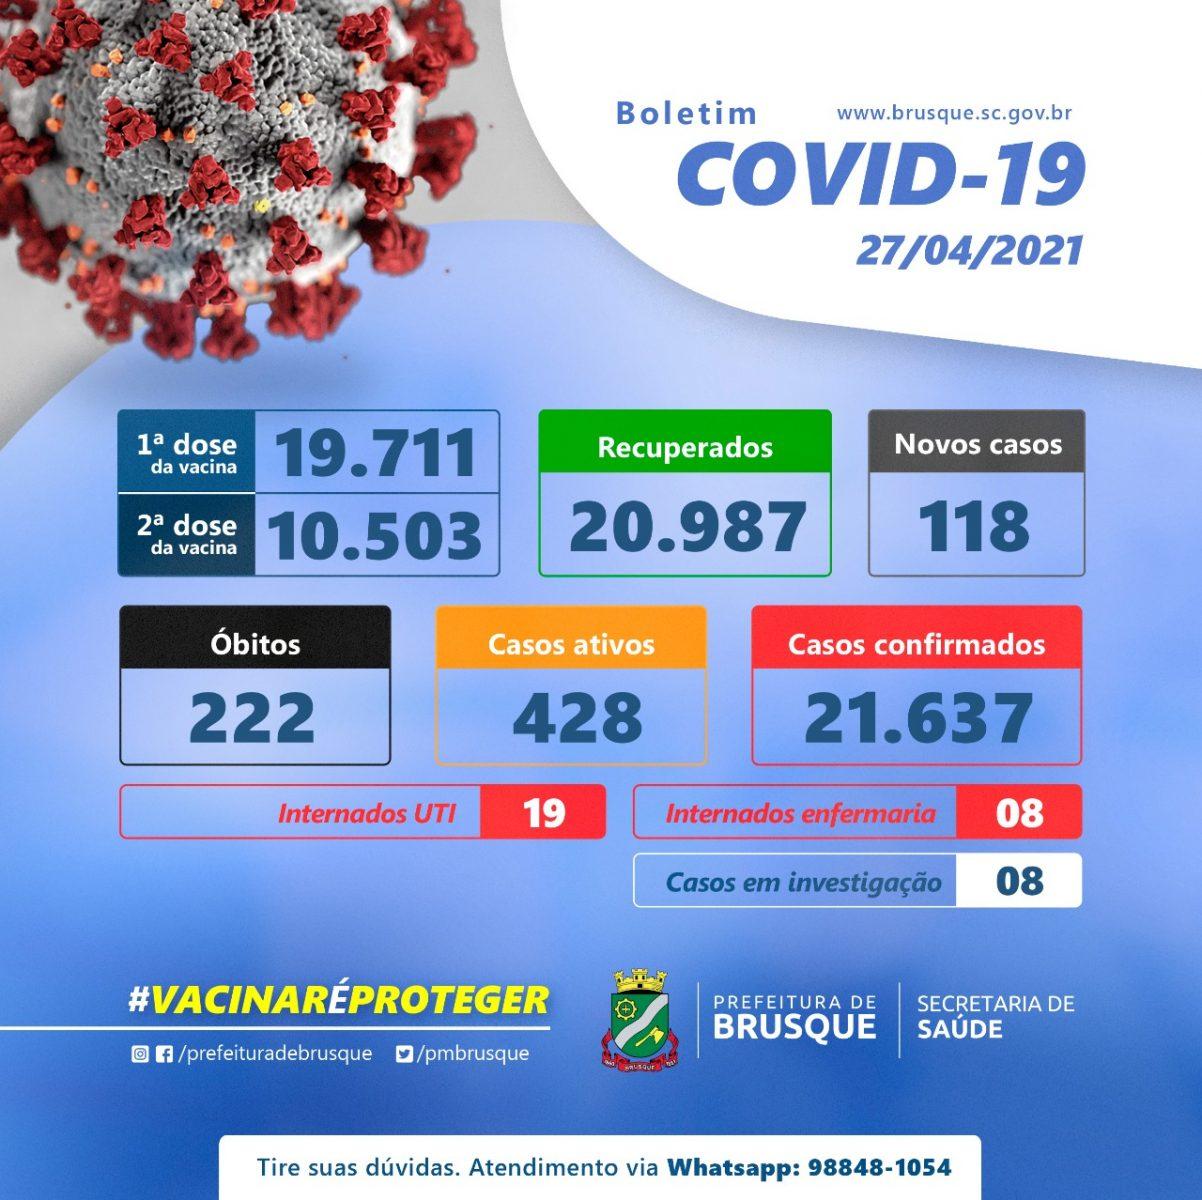 Covid 19: Confira o boletim epidemiológico desta terça-feira (27)